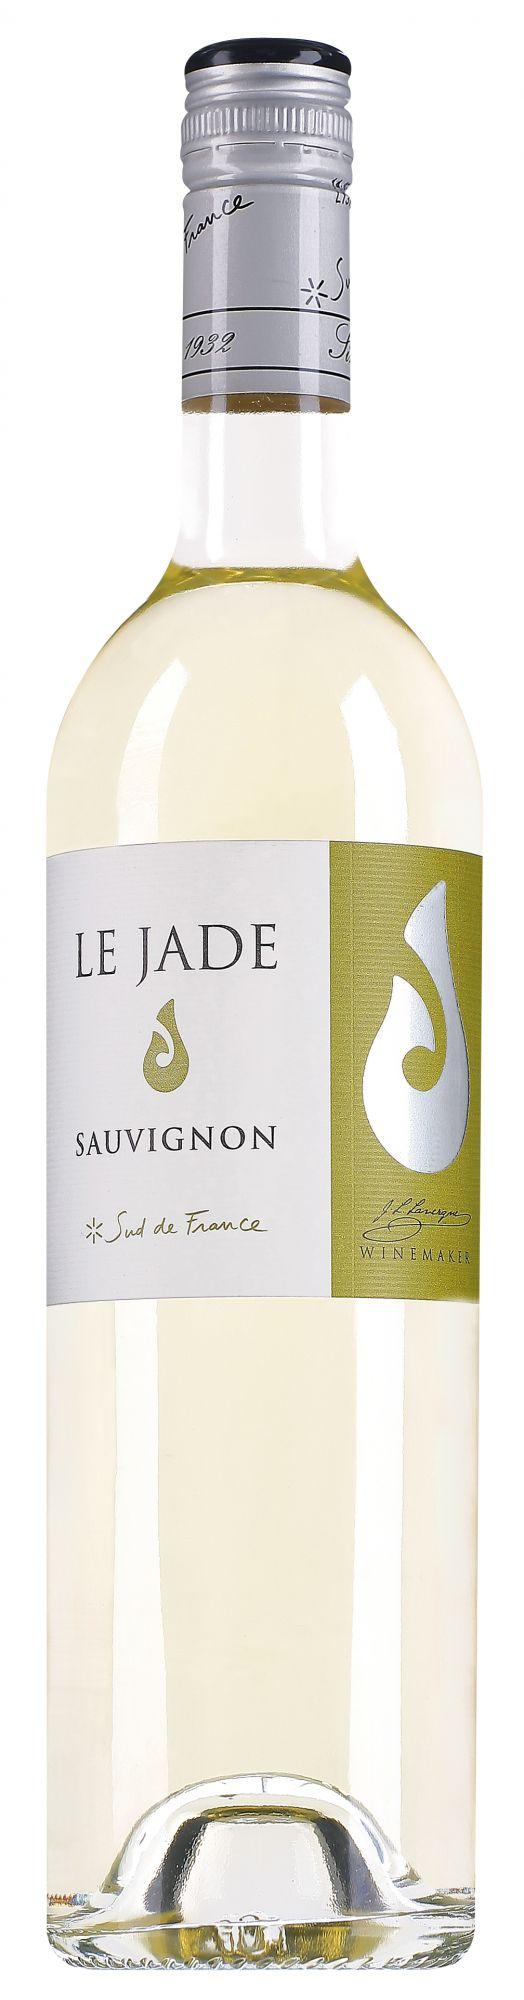 Le Jade Côtes de Thau Sauvignon Blanc